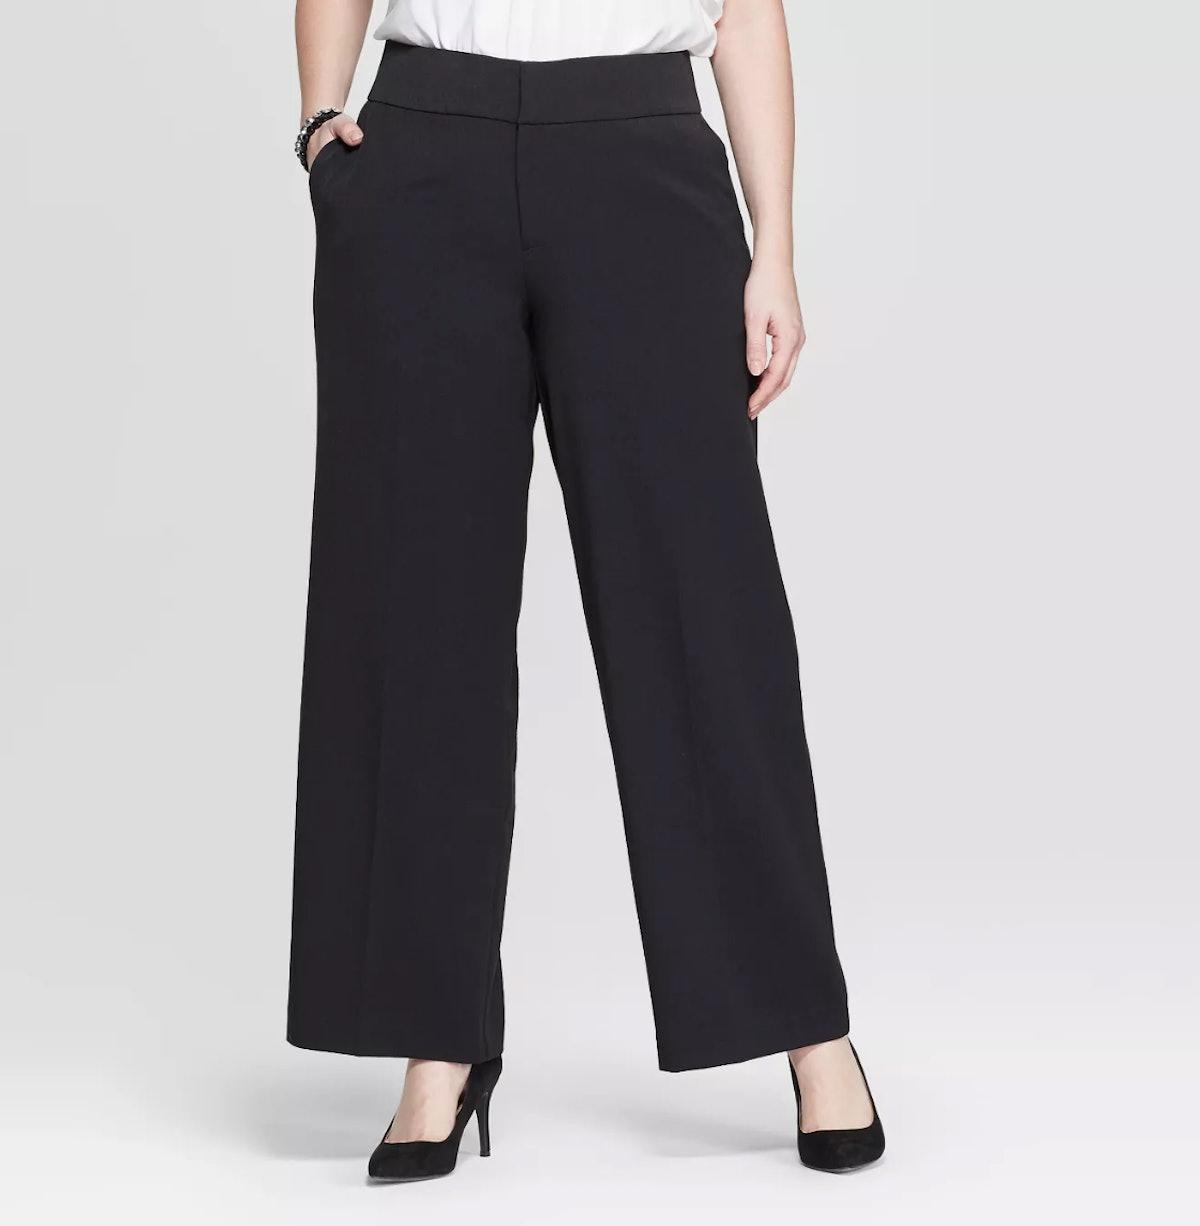 Women's Plus Size Wide Leg Trouser Pants - Ava & Viv